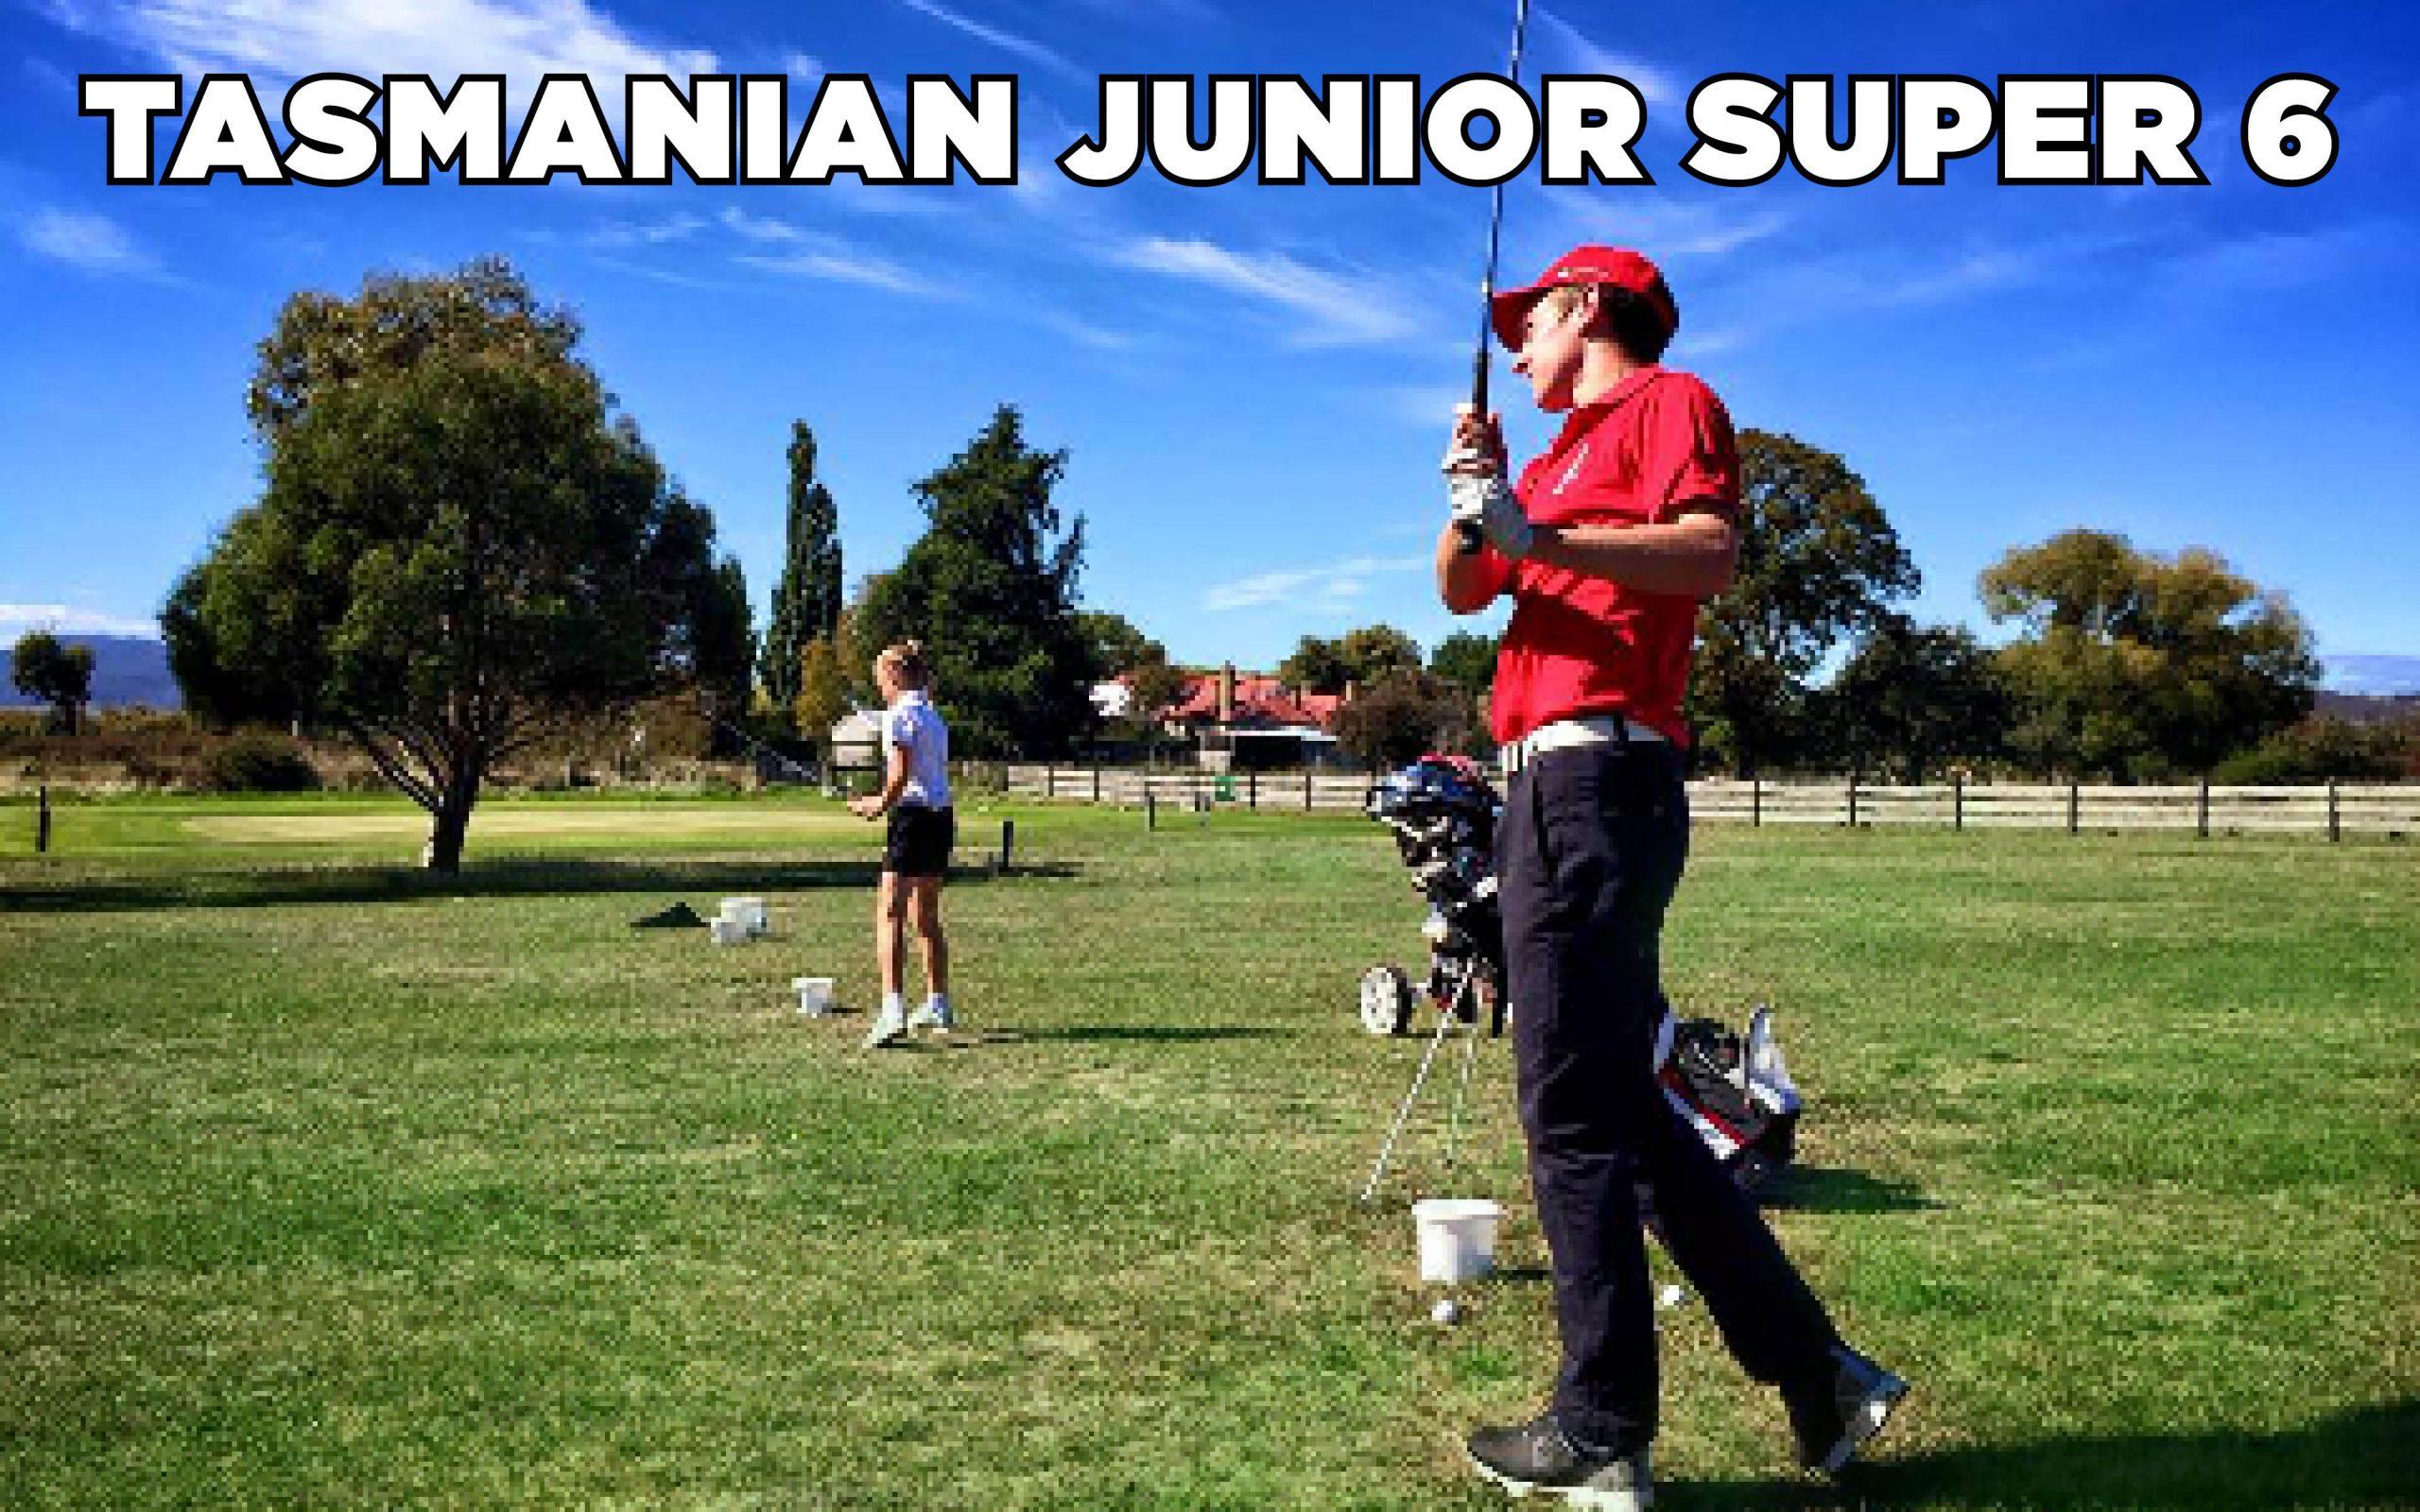 Tasmanian Junior Super 6 at Ratho Farm: 14 & 15 July, 2021